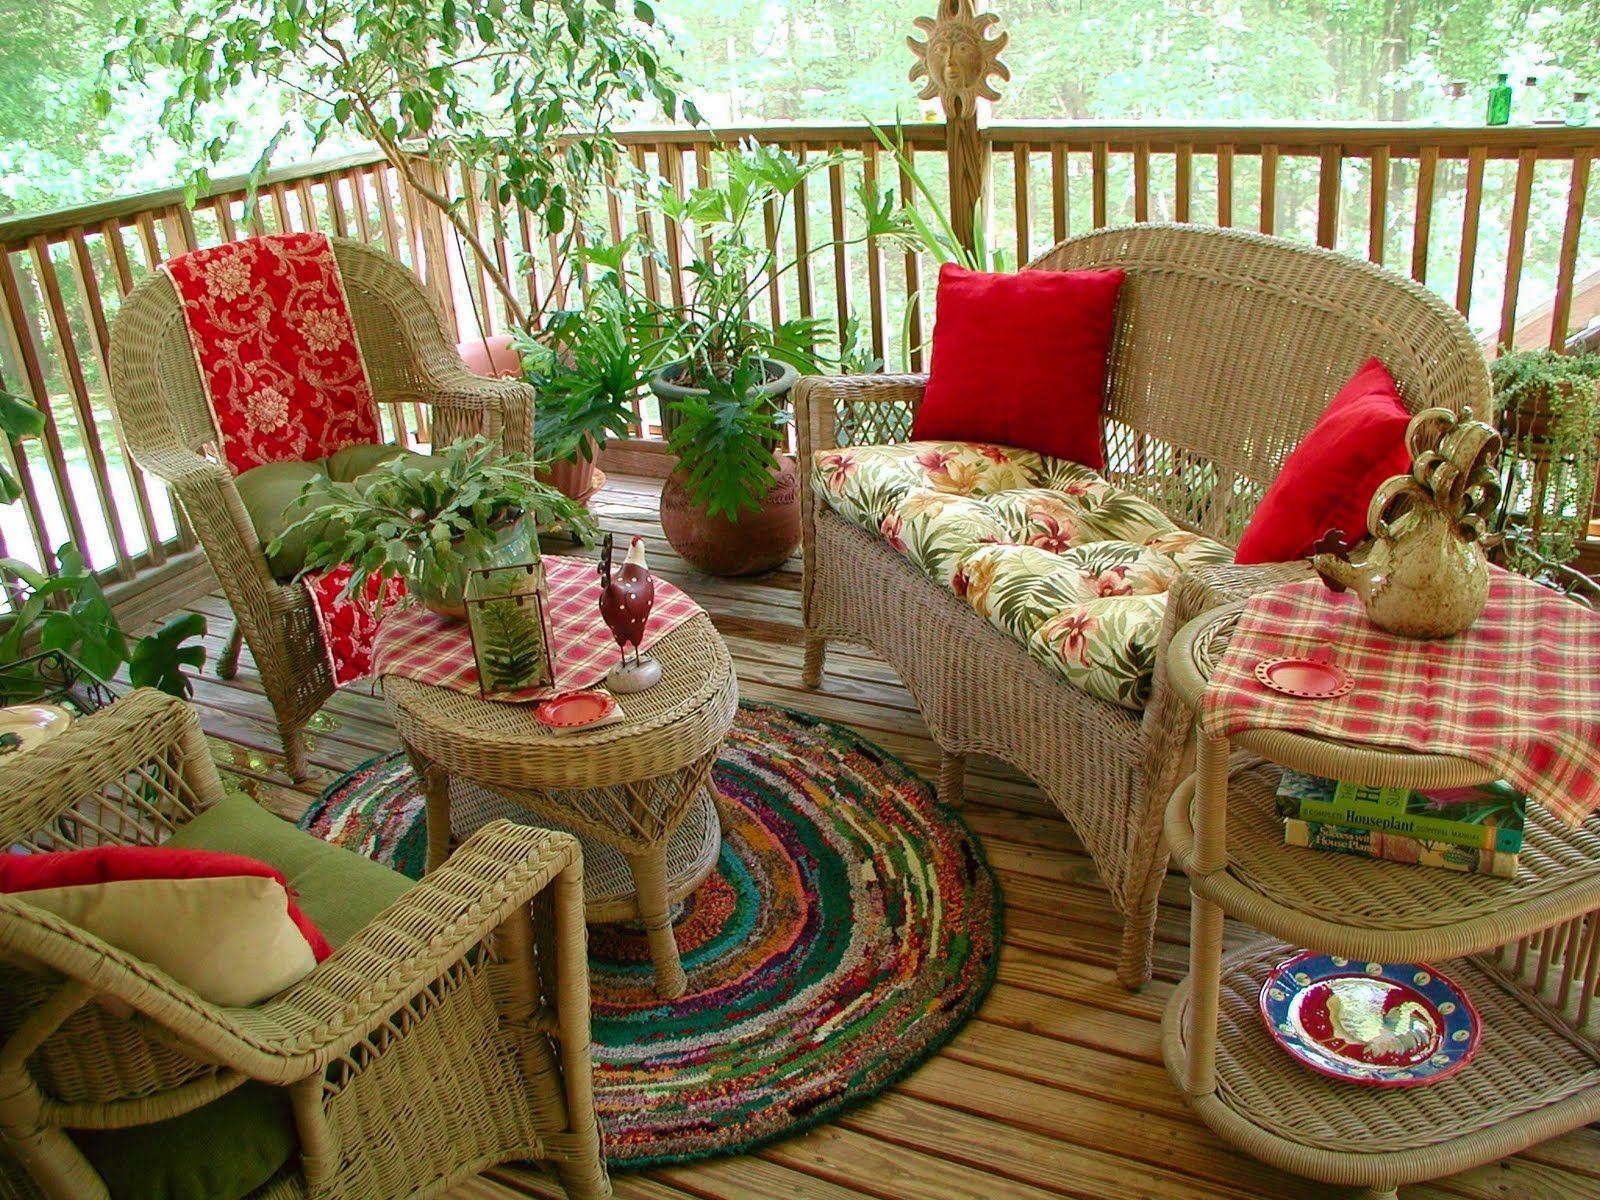 Beautiful outdoor living...